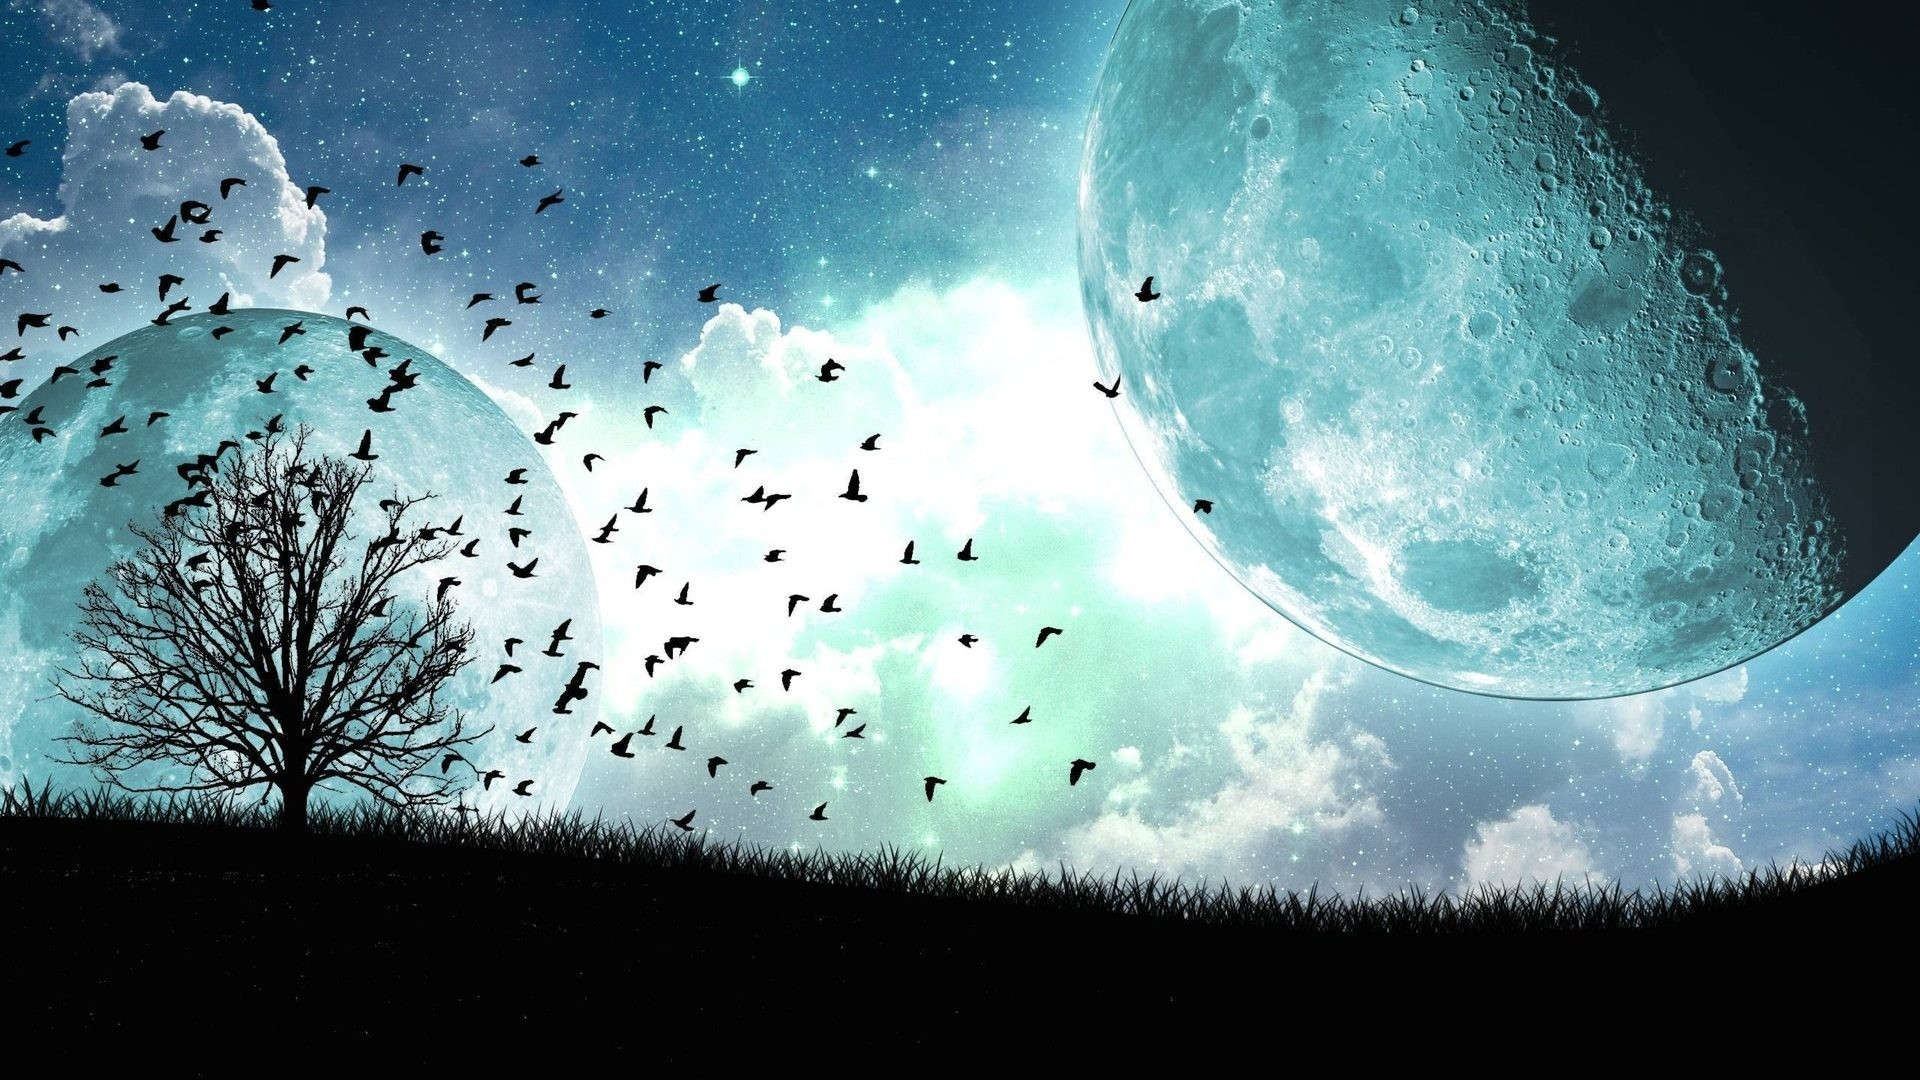 Fantasy Tag – Dream Vector Moon Birds Sci Fantasy Sky Nature Wallpaper  Latest Download for HD